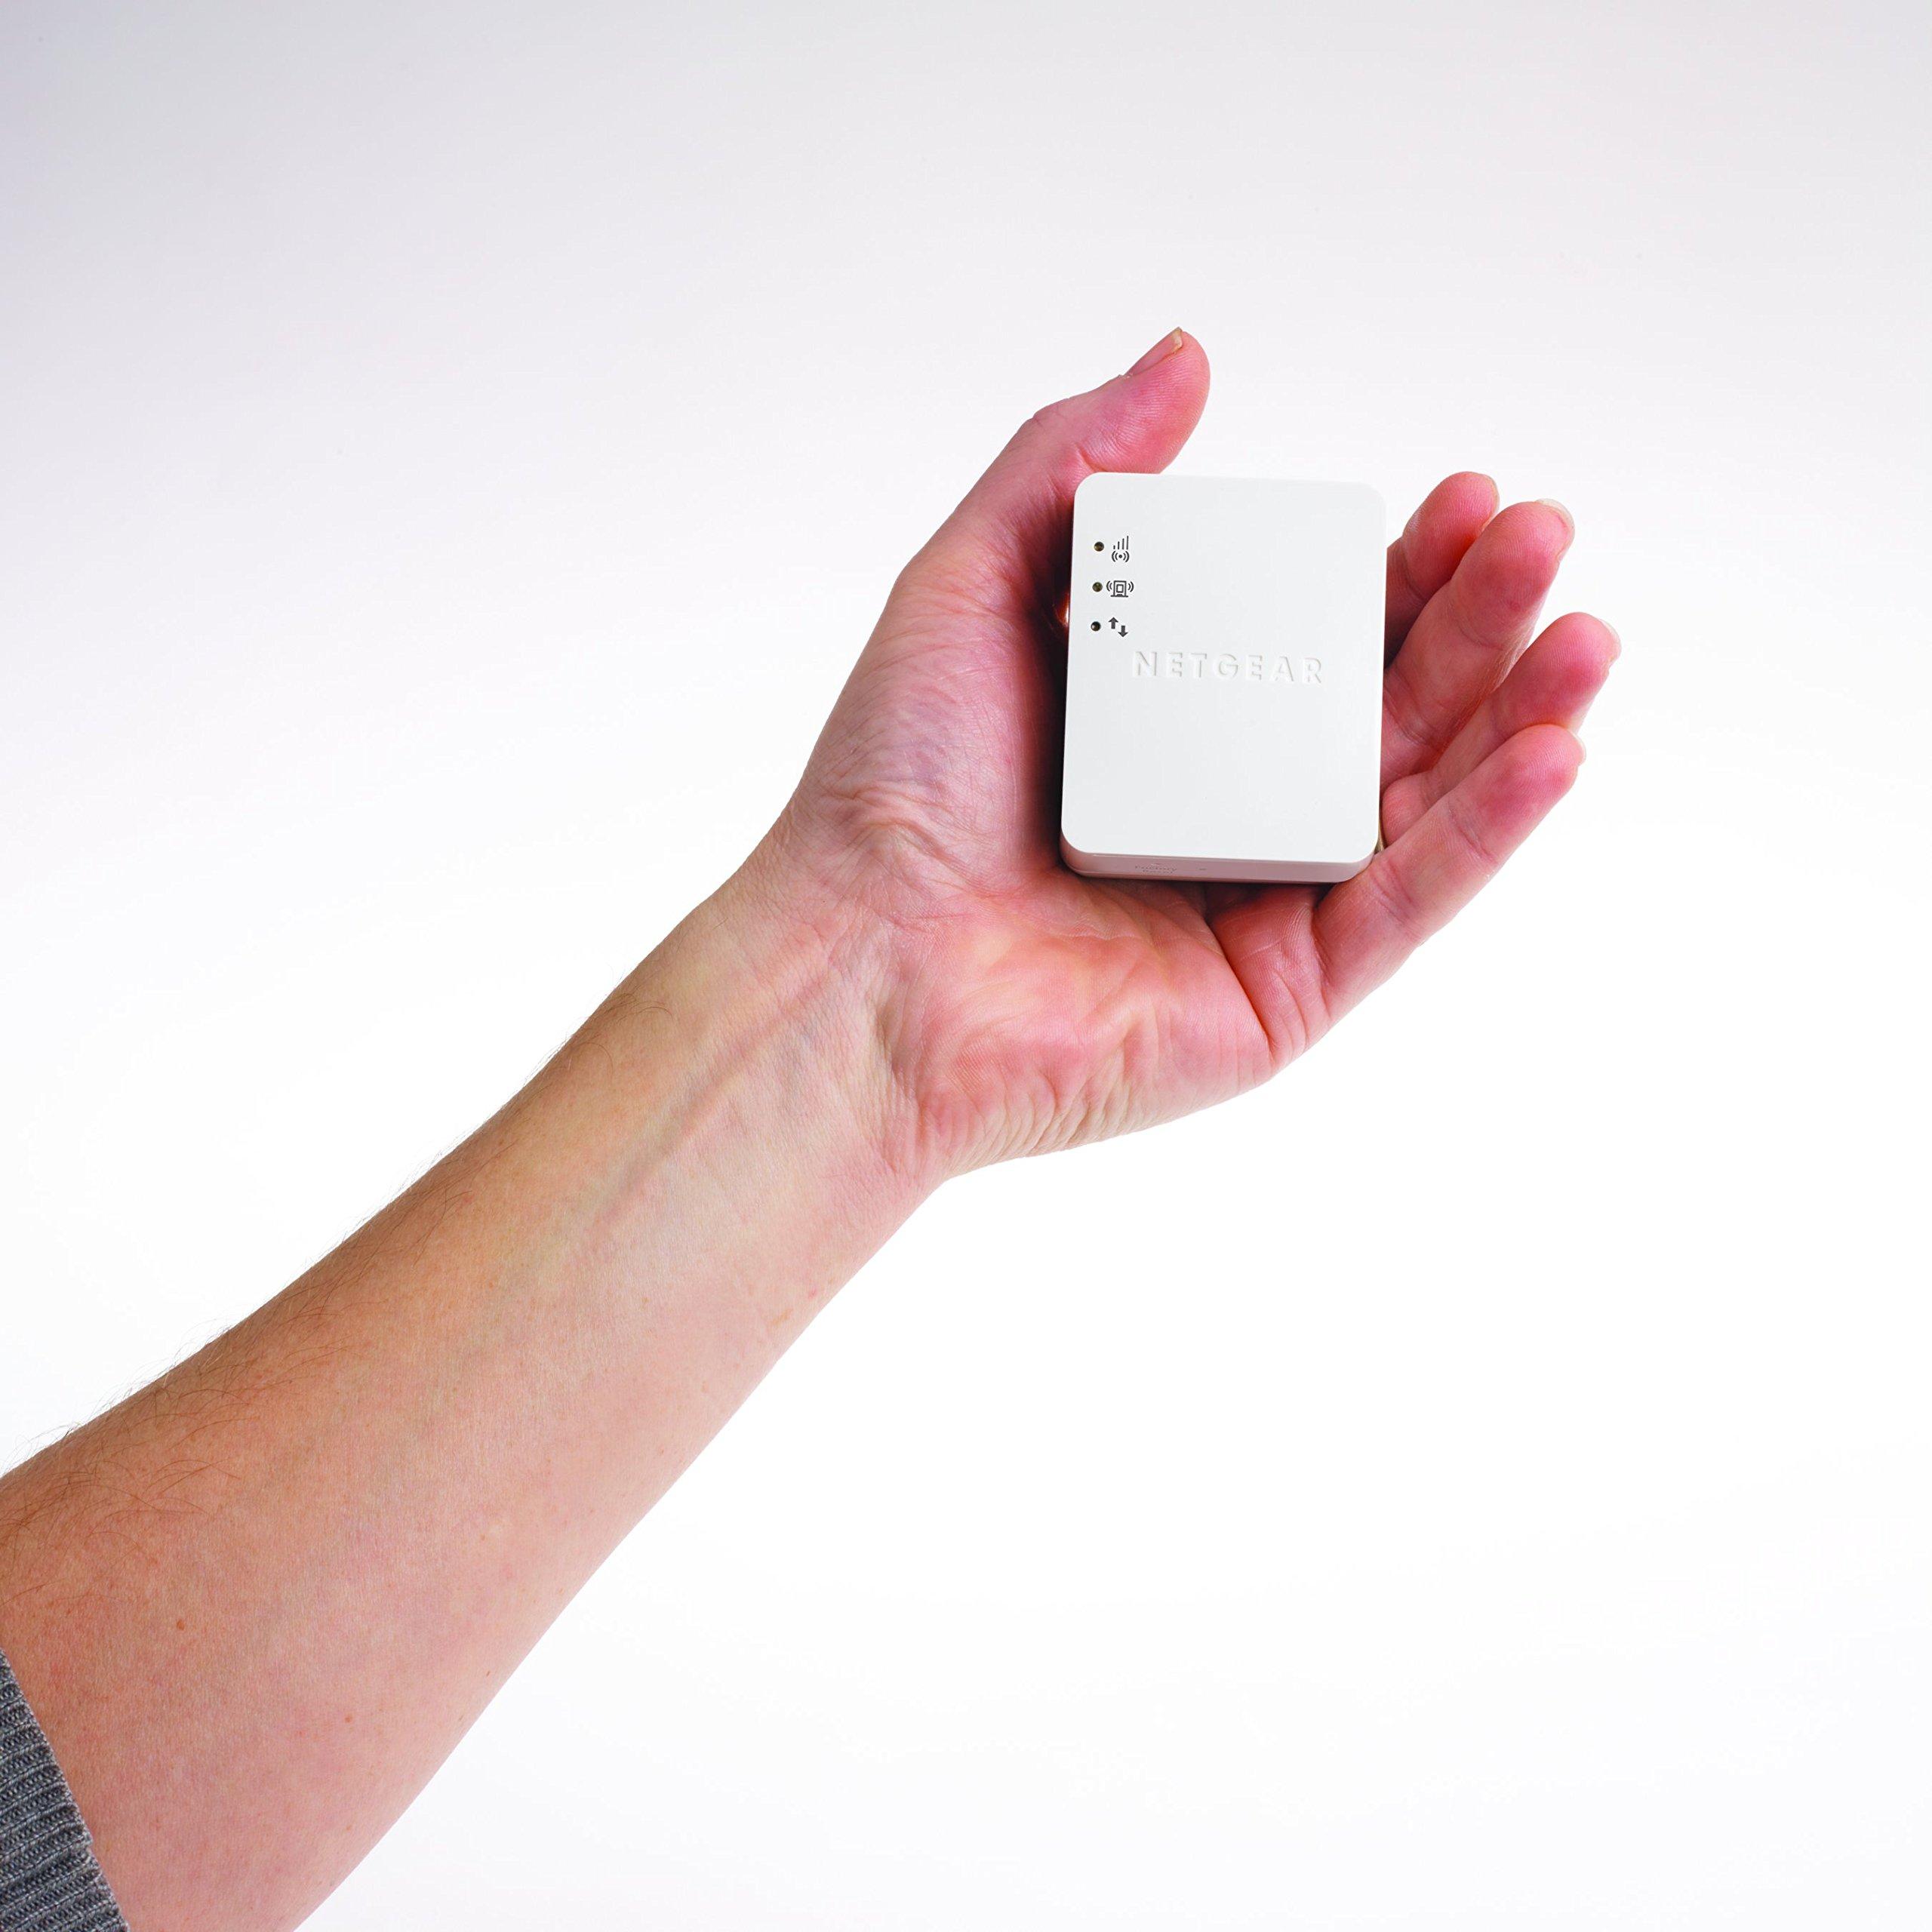 NETGEAR N150 Wi-Fi Range Extender for Mobile - Wall Plug Version (WN1000RP) by NETGEAR (Image #7)